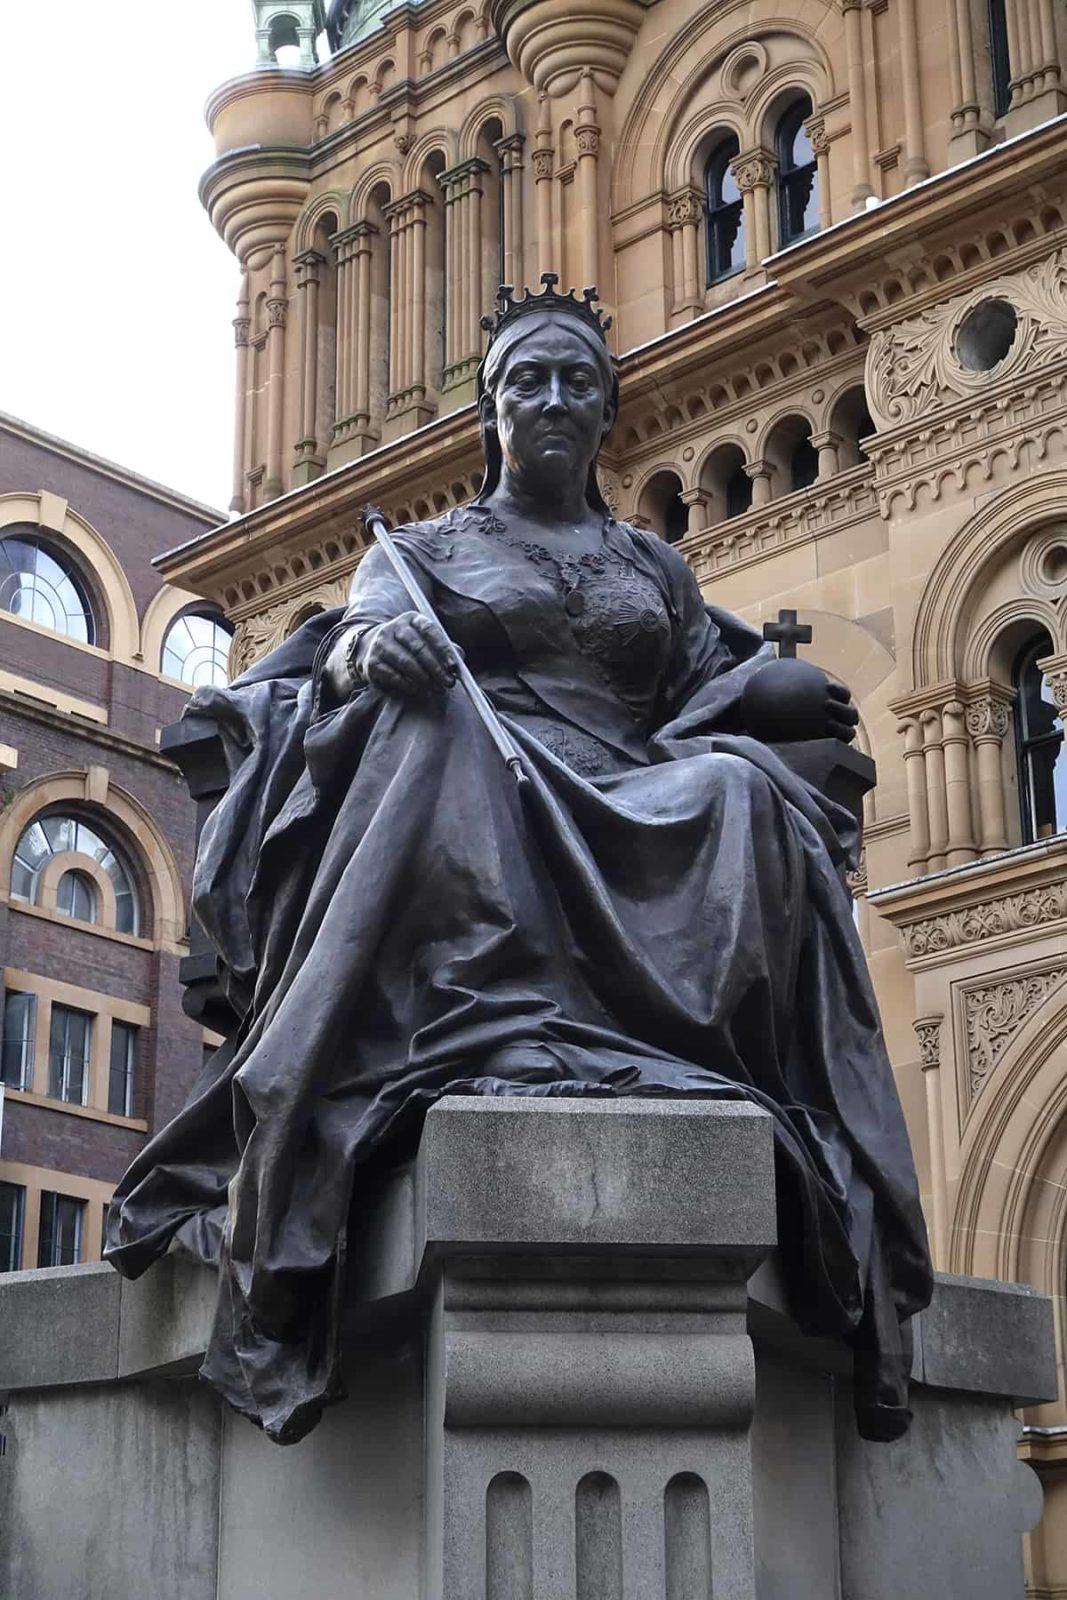 Robin Botie of ithaca, New York, photographs statue of Queen Victoria in Sydney, Australia.